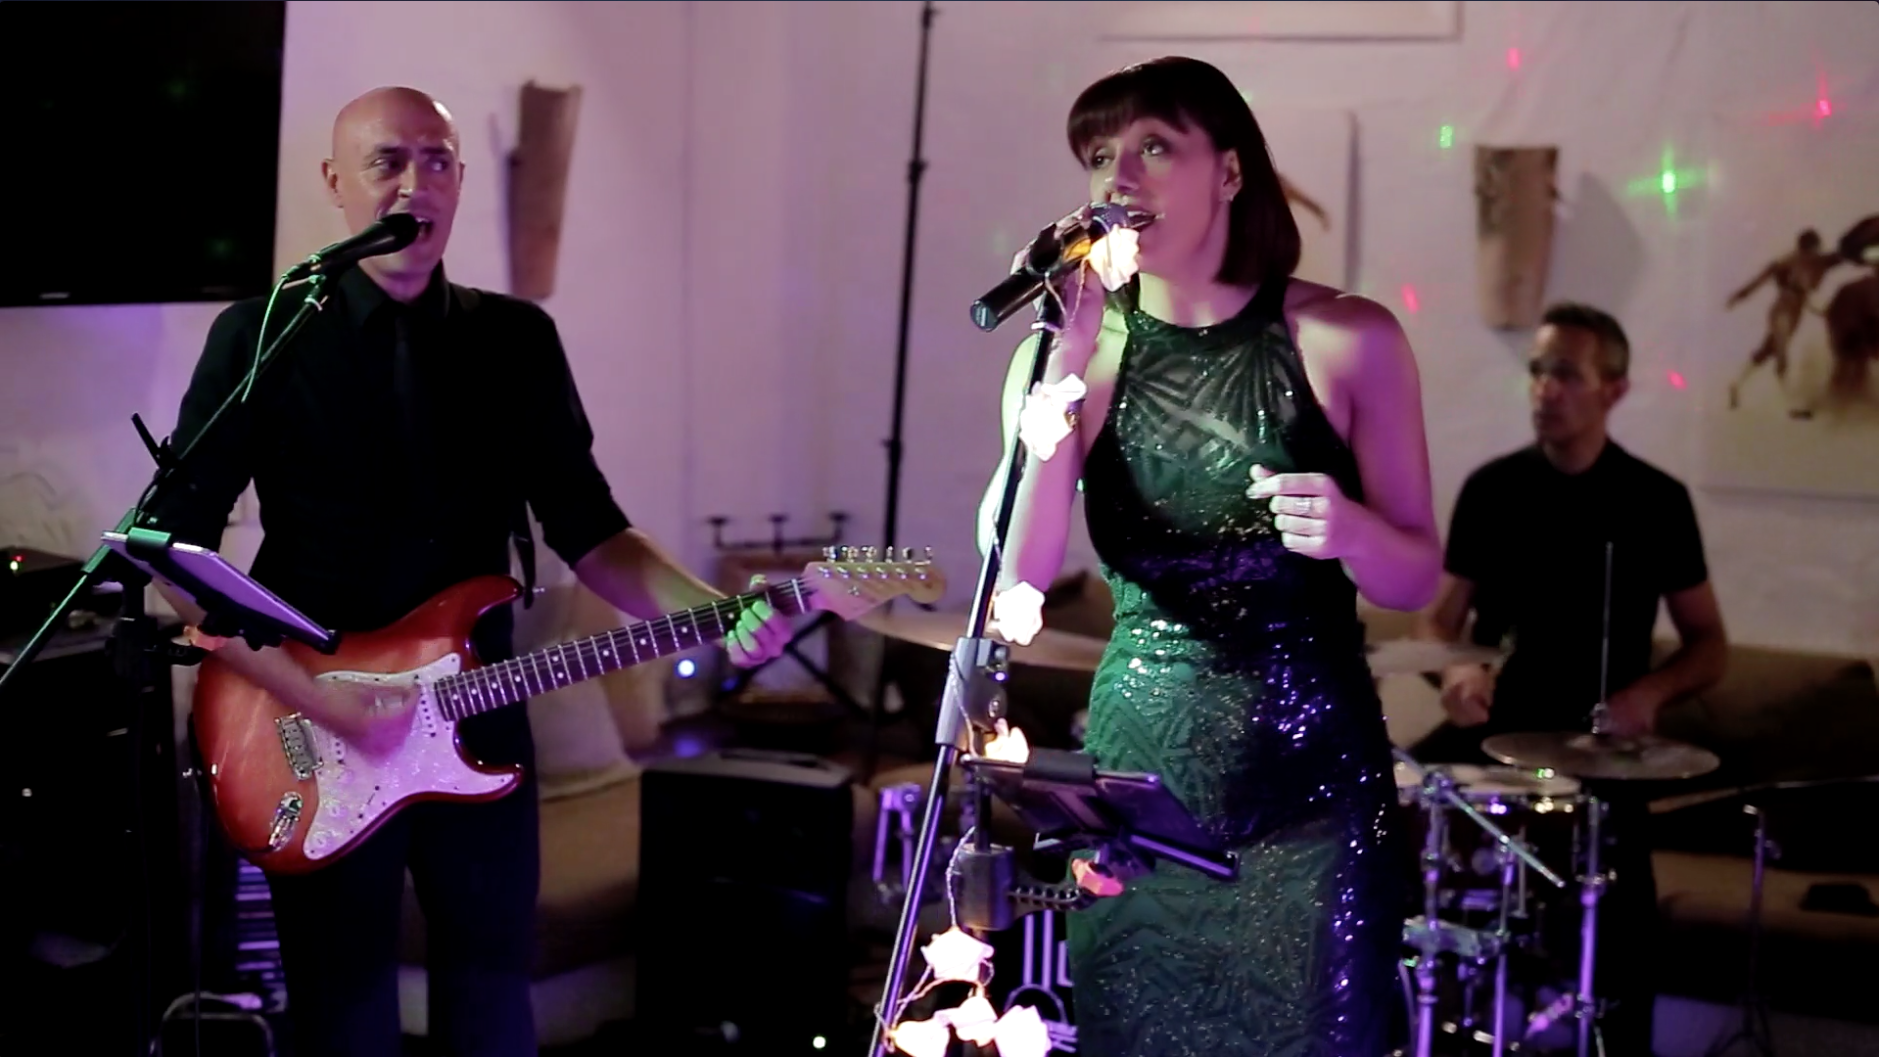 Spanish Wedding Band Lead Singer